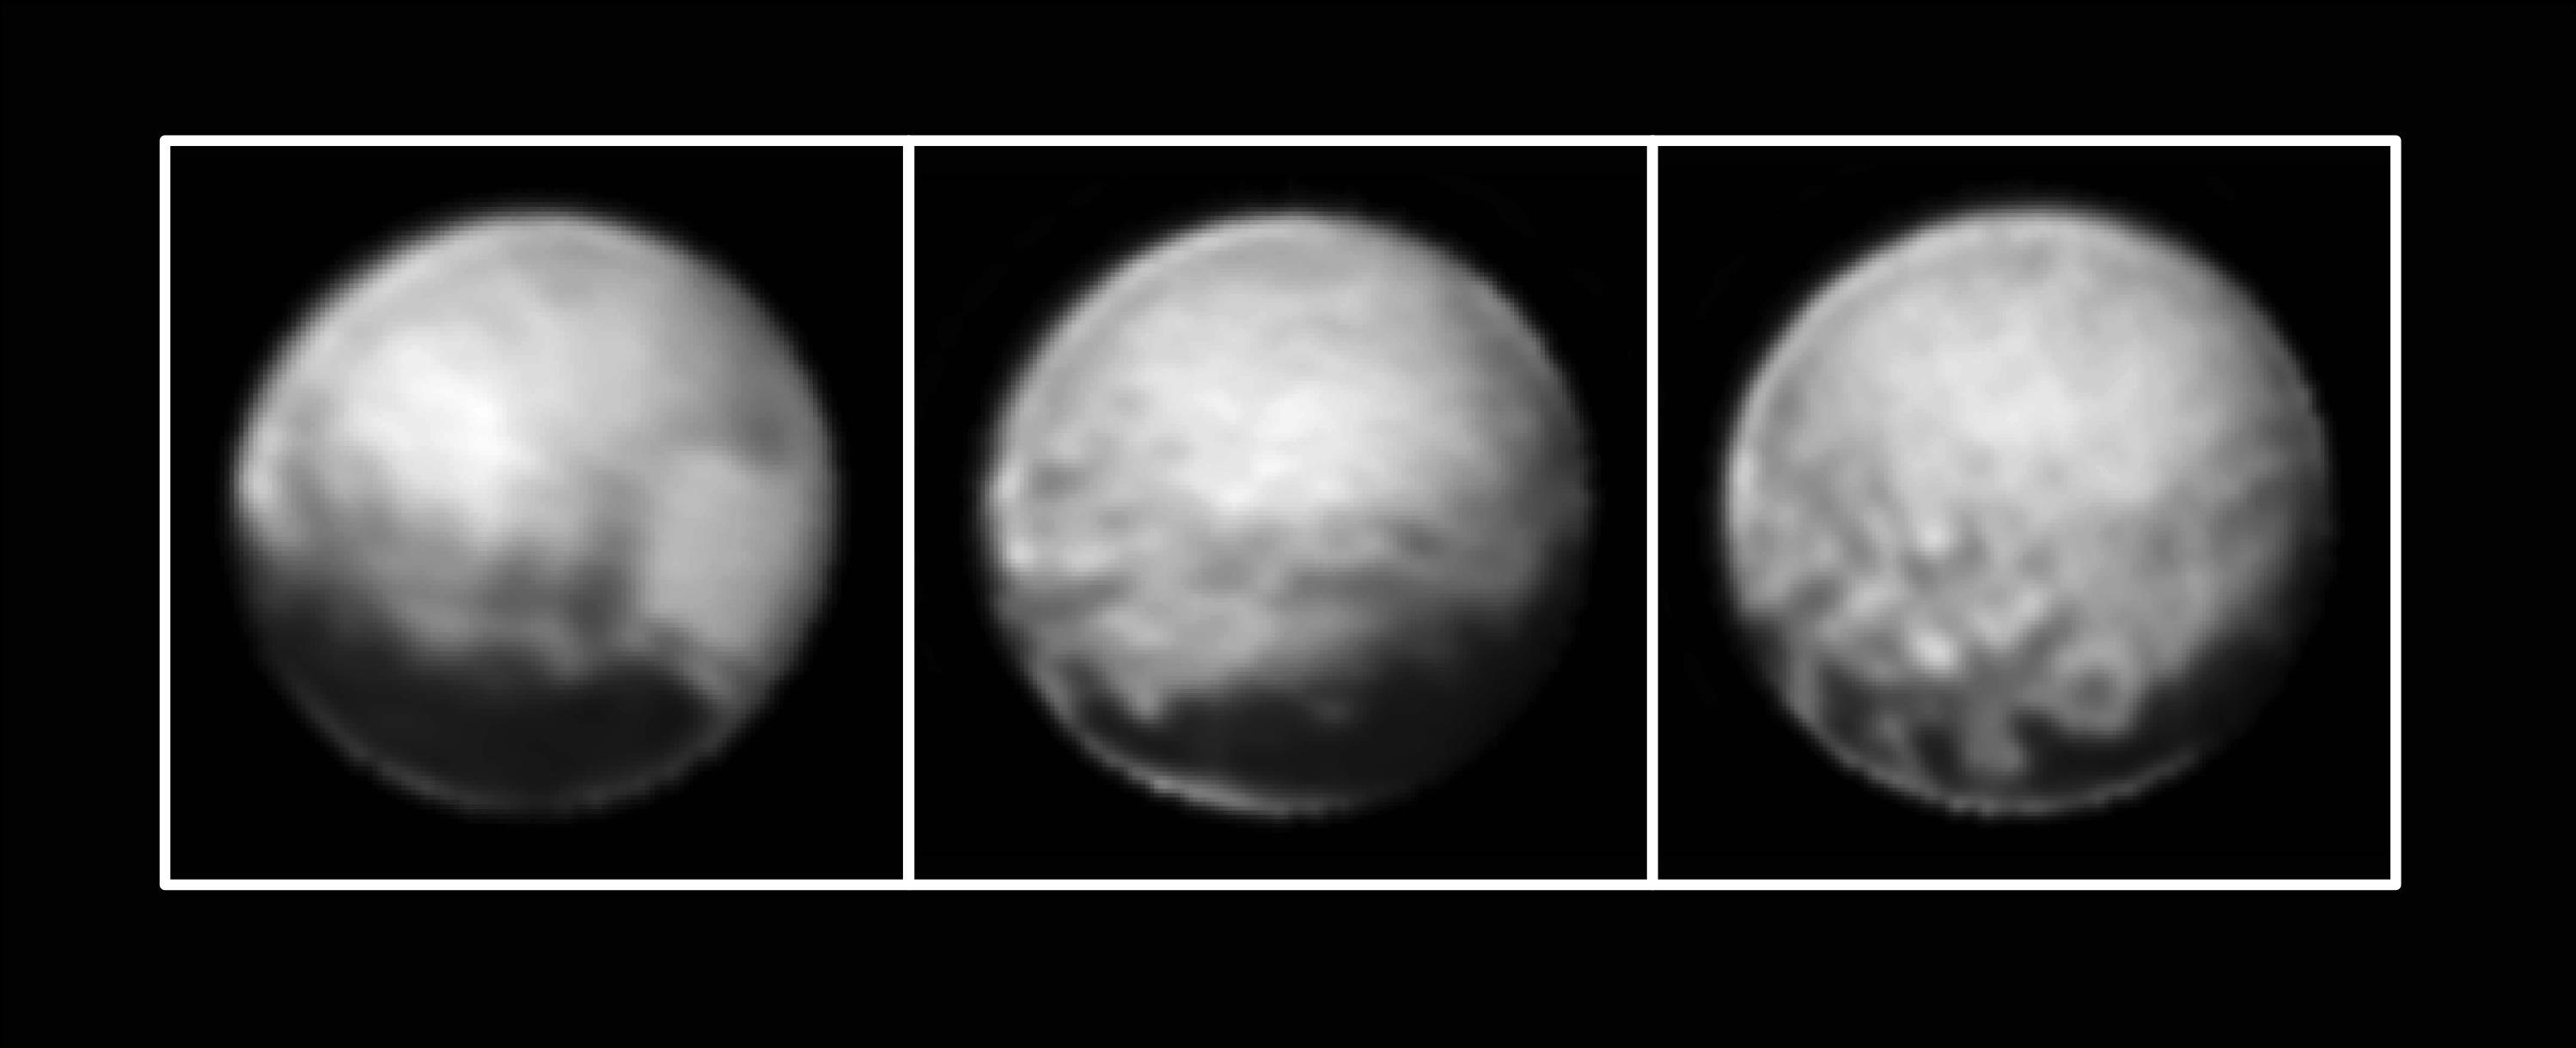 Kerberos Moon Of Plluto: At Last! NASA Spacecraft To Capture A Close-Up Of Pluto